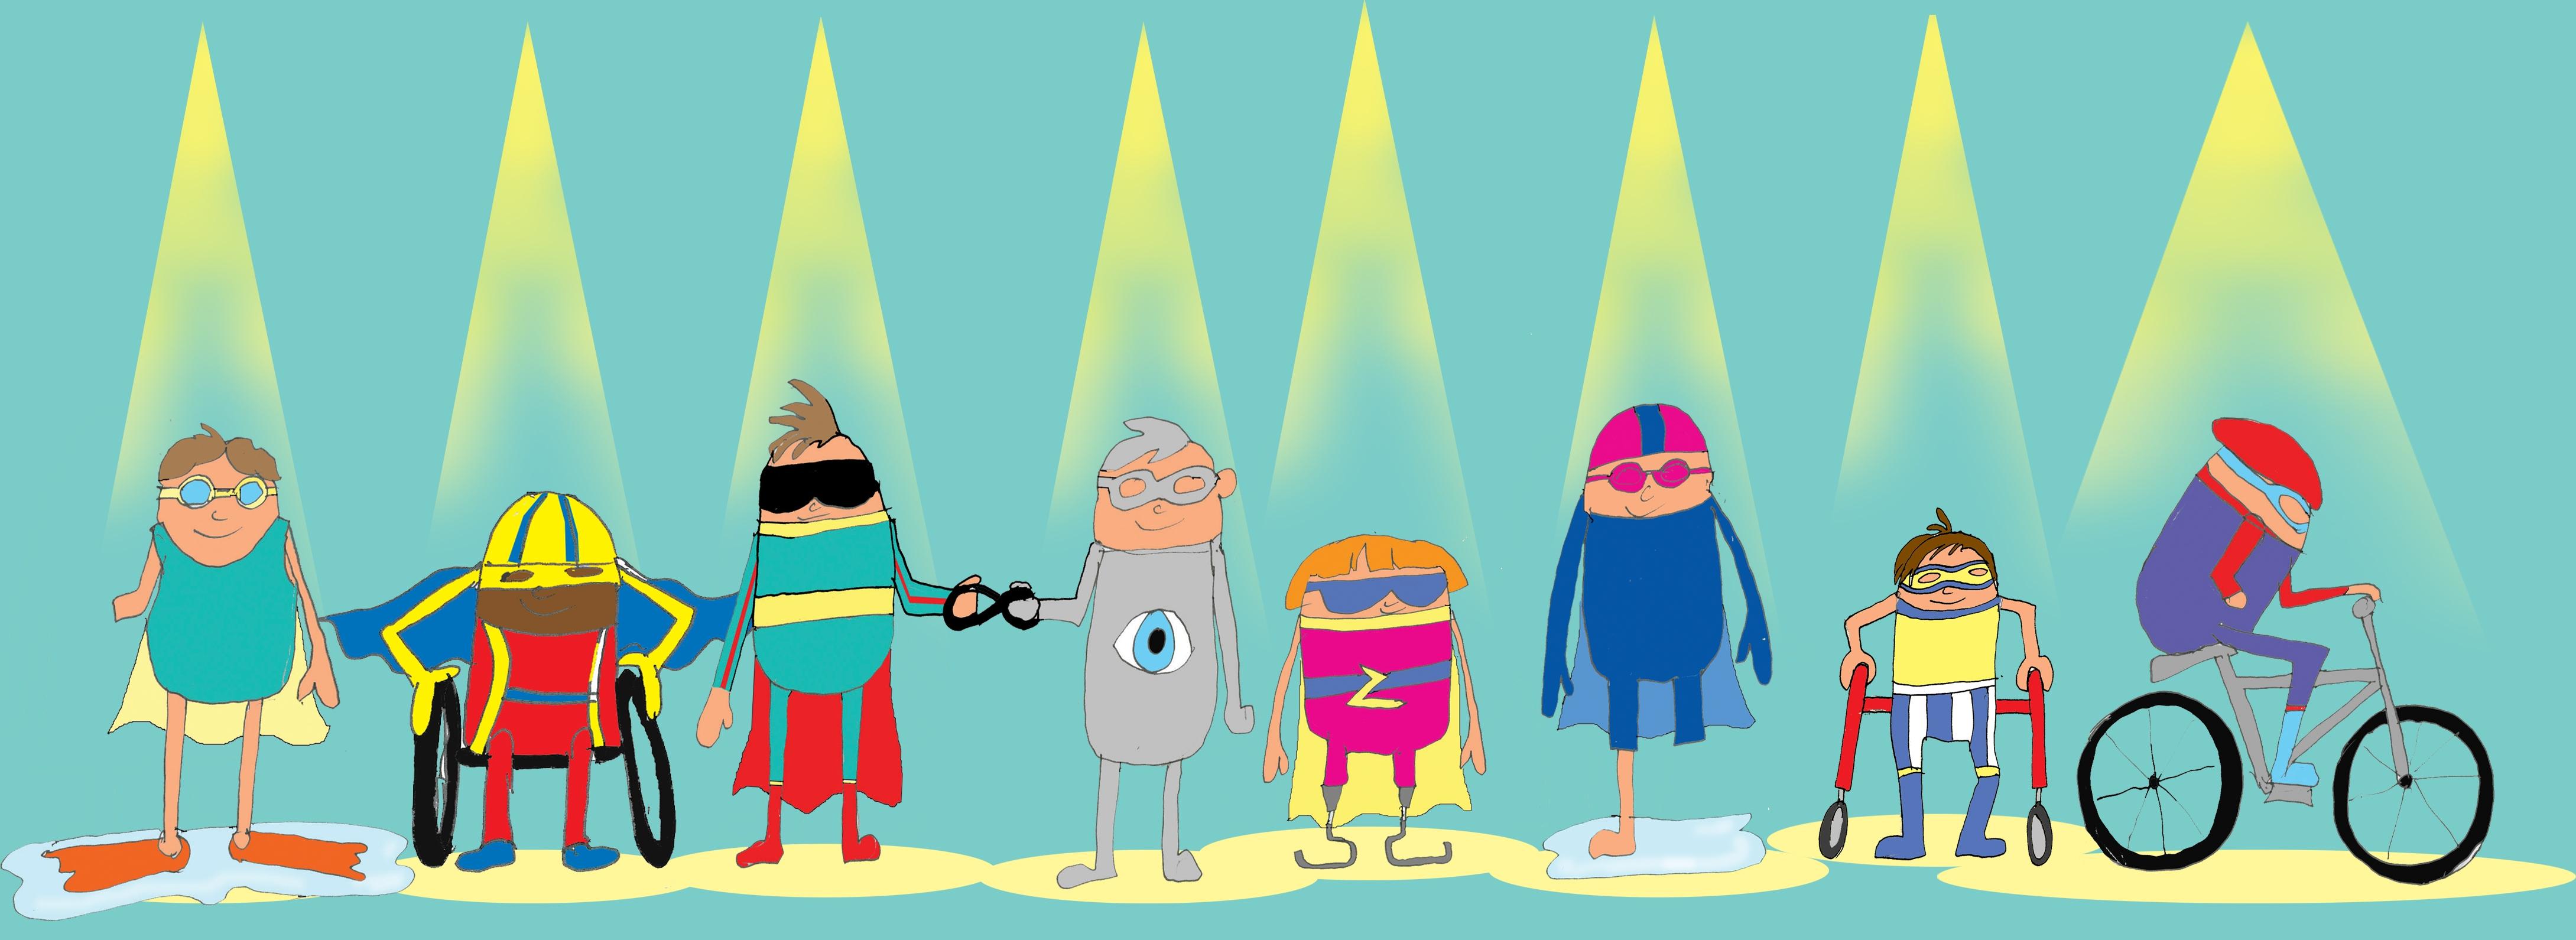 A row of cartoon athletes under a spotlight